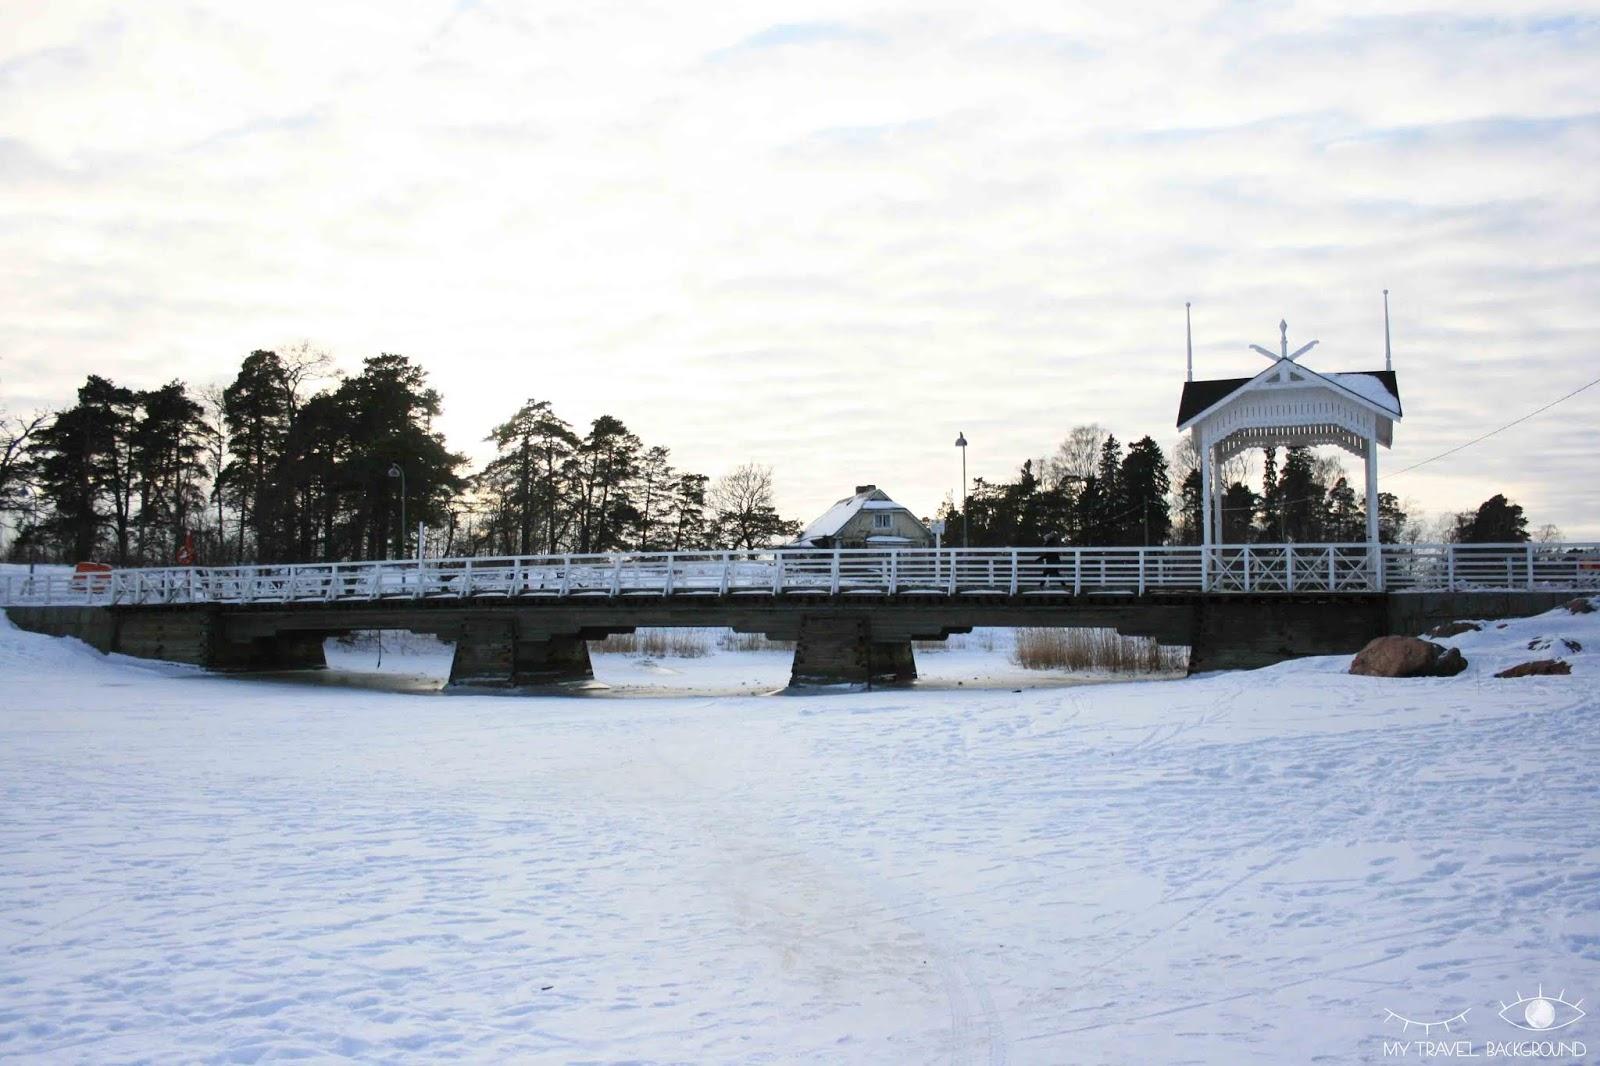 My Travel Background : road trip de 10 jours autour de la mer baltique : Danemark, Finlande, Estonie - Mer gelée, Helsinki, Finlande